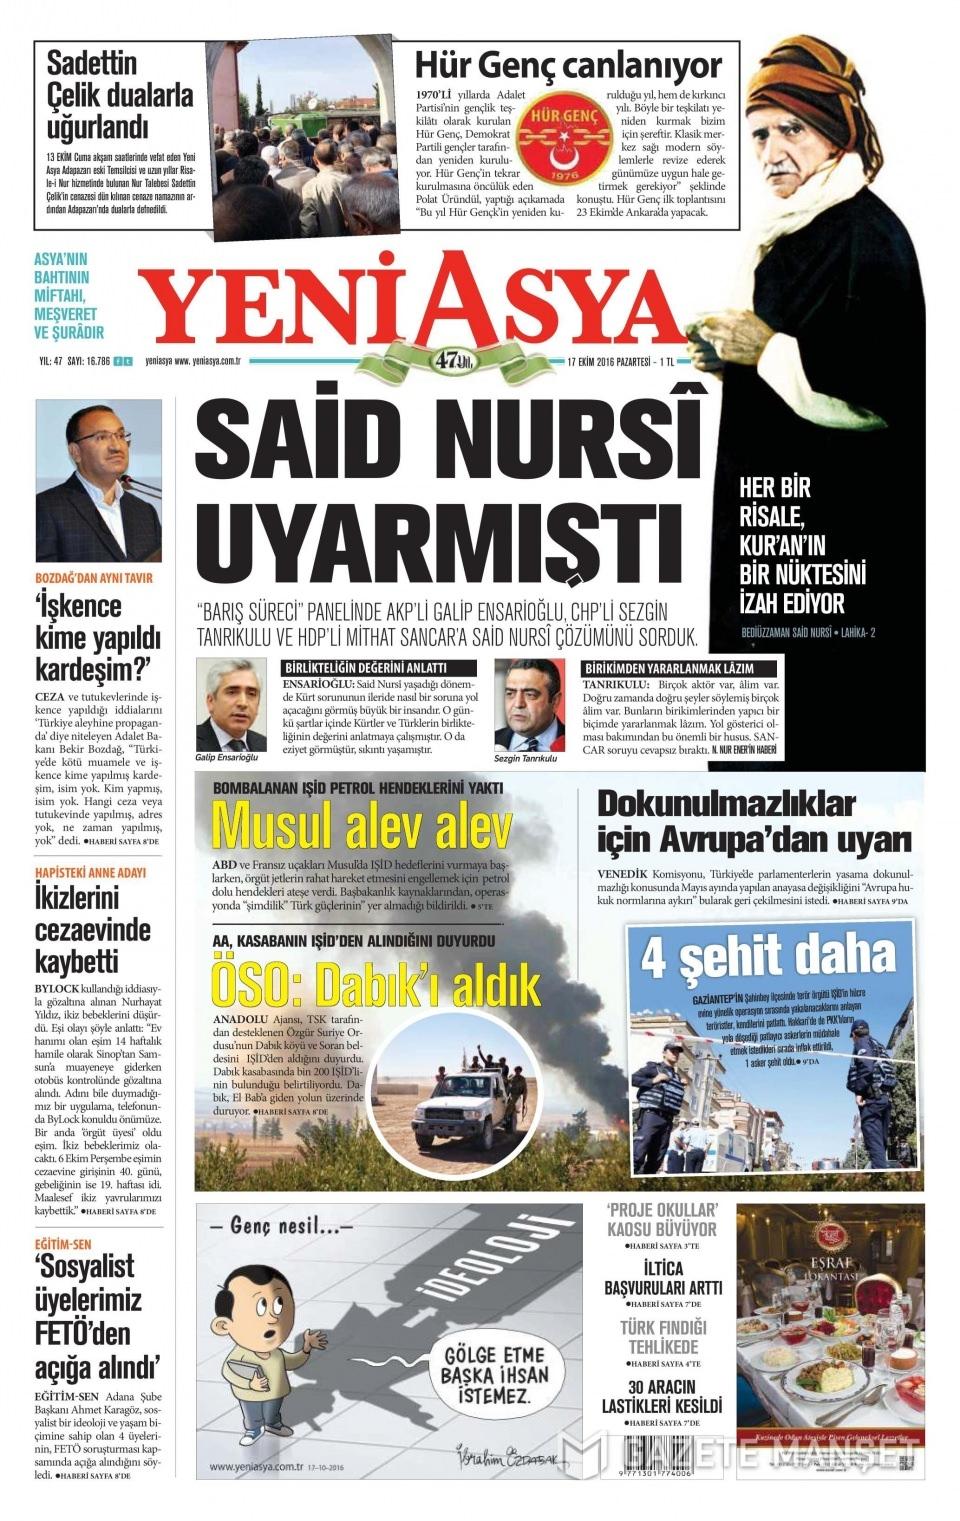 17 Ekim Pazartesi gazete manşetleri 18